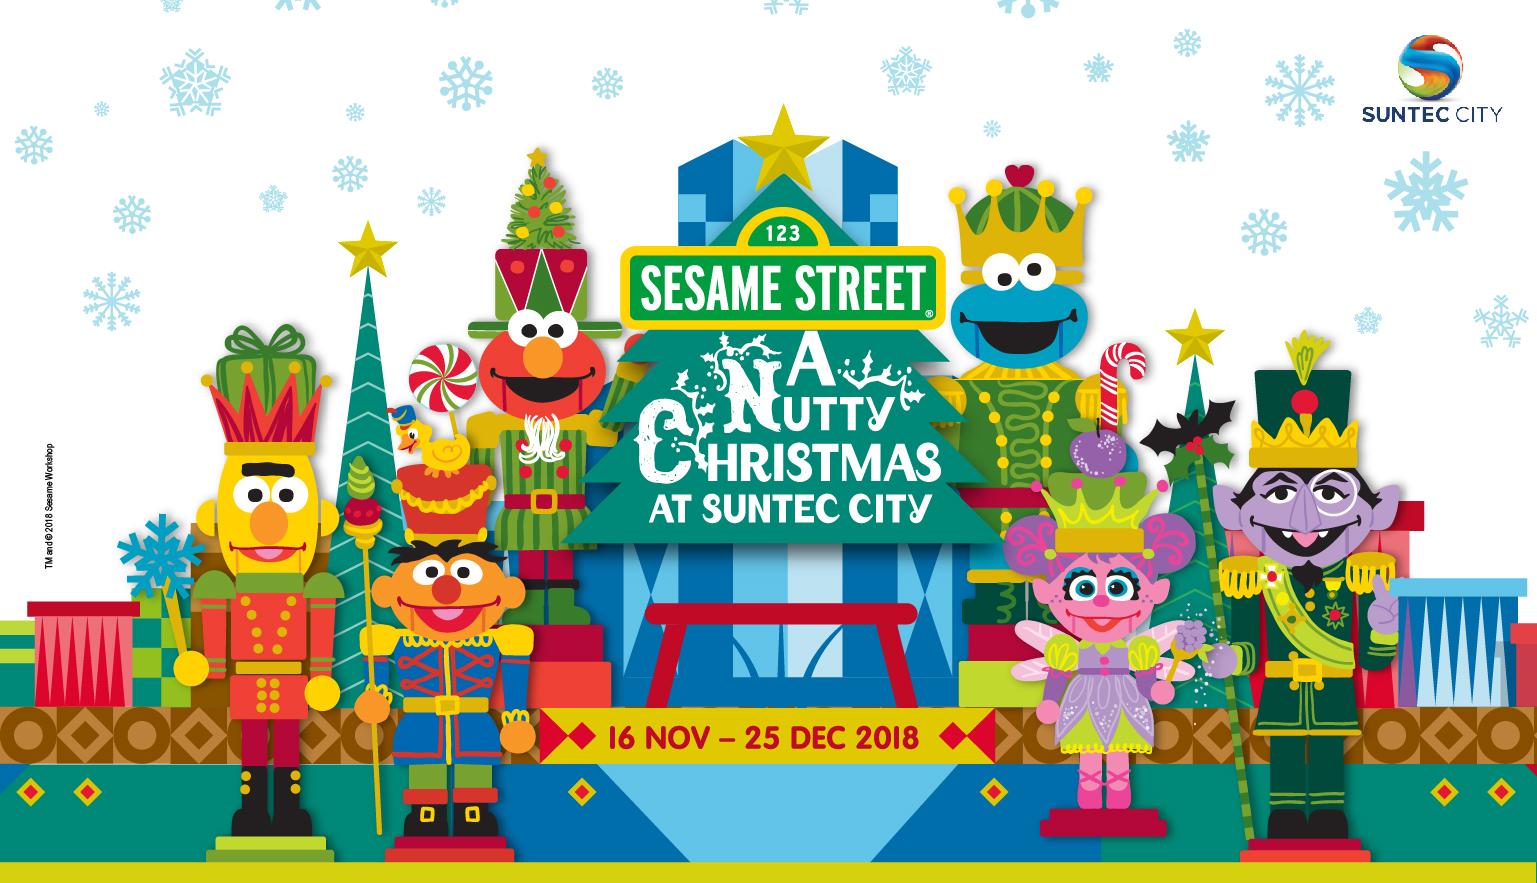 Christmas free parking Suntec City